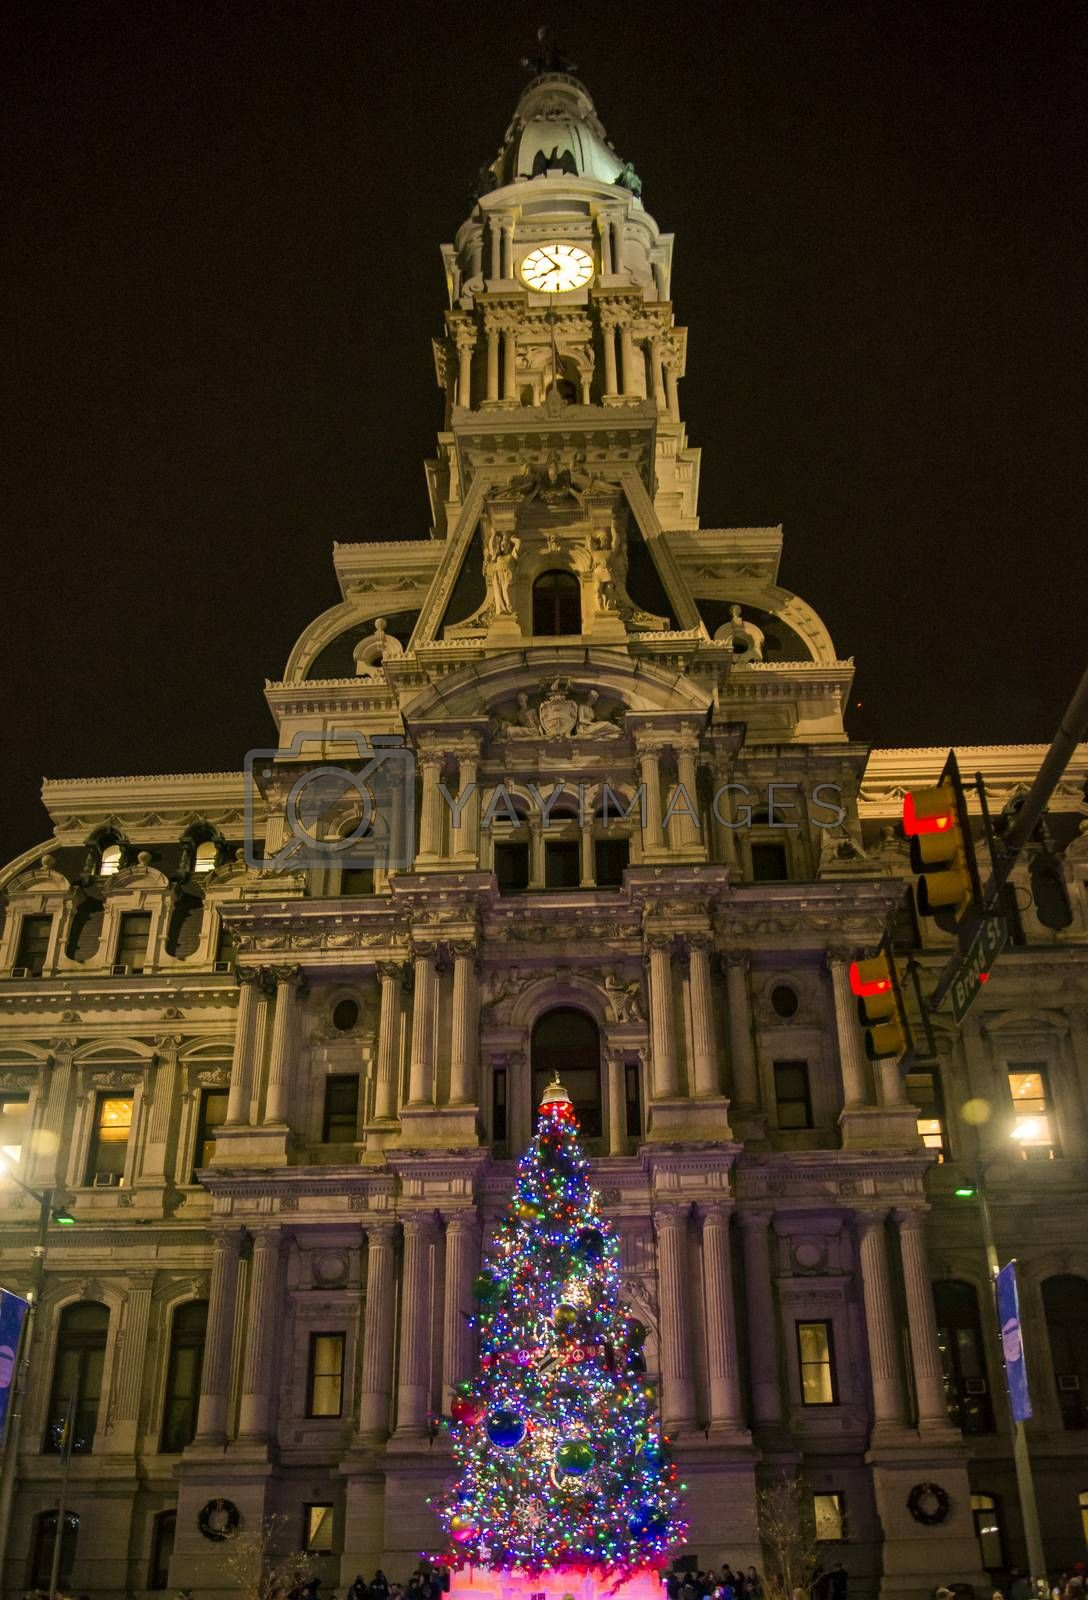 the famous Philadelphia city hall by night, Pennsylvania USA